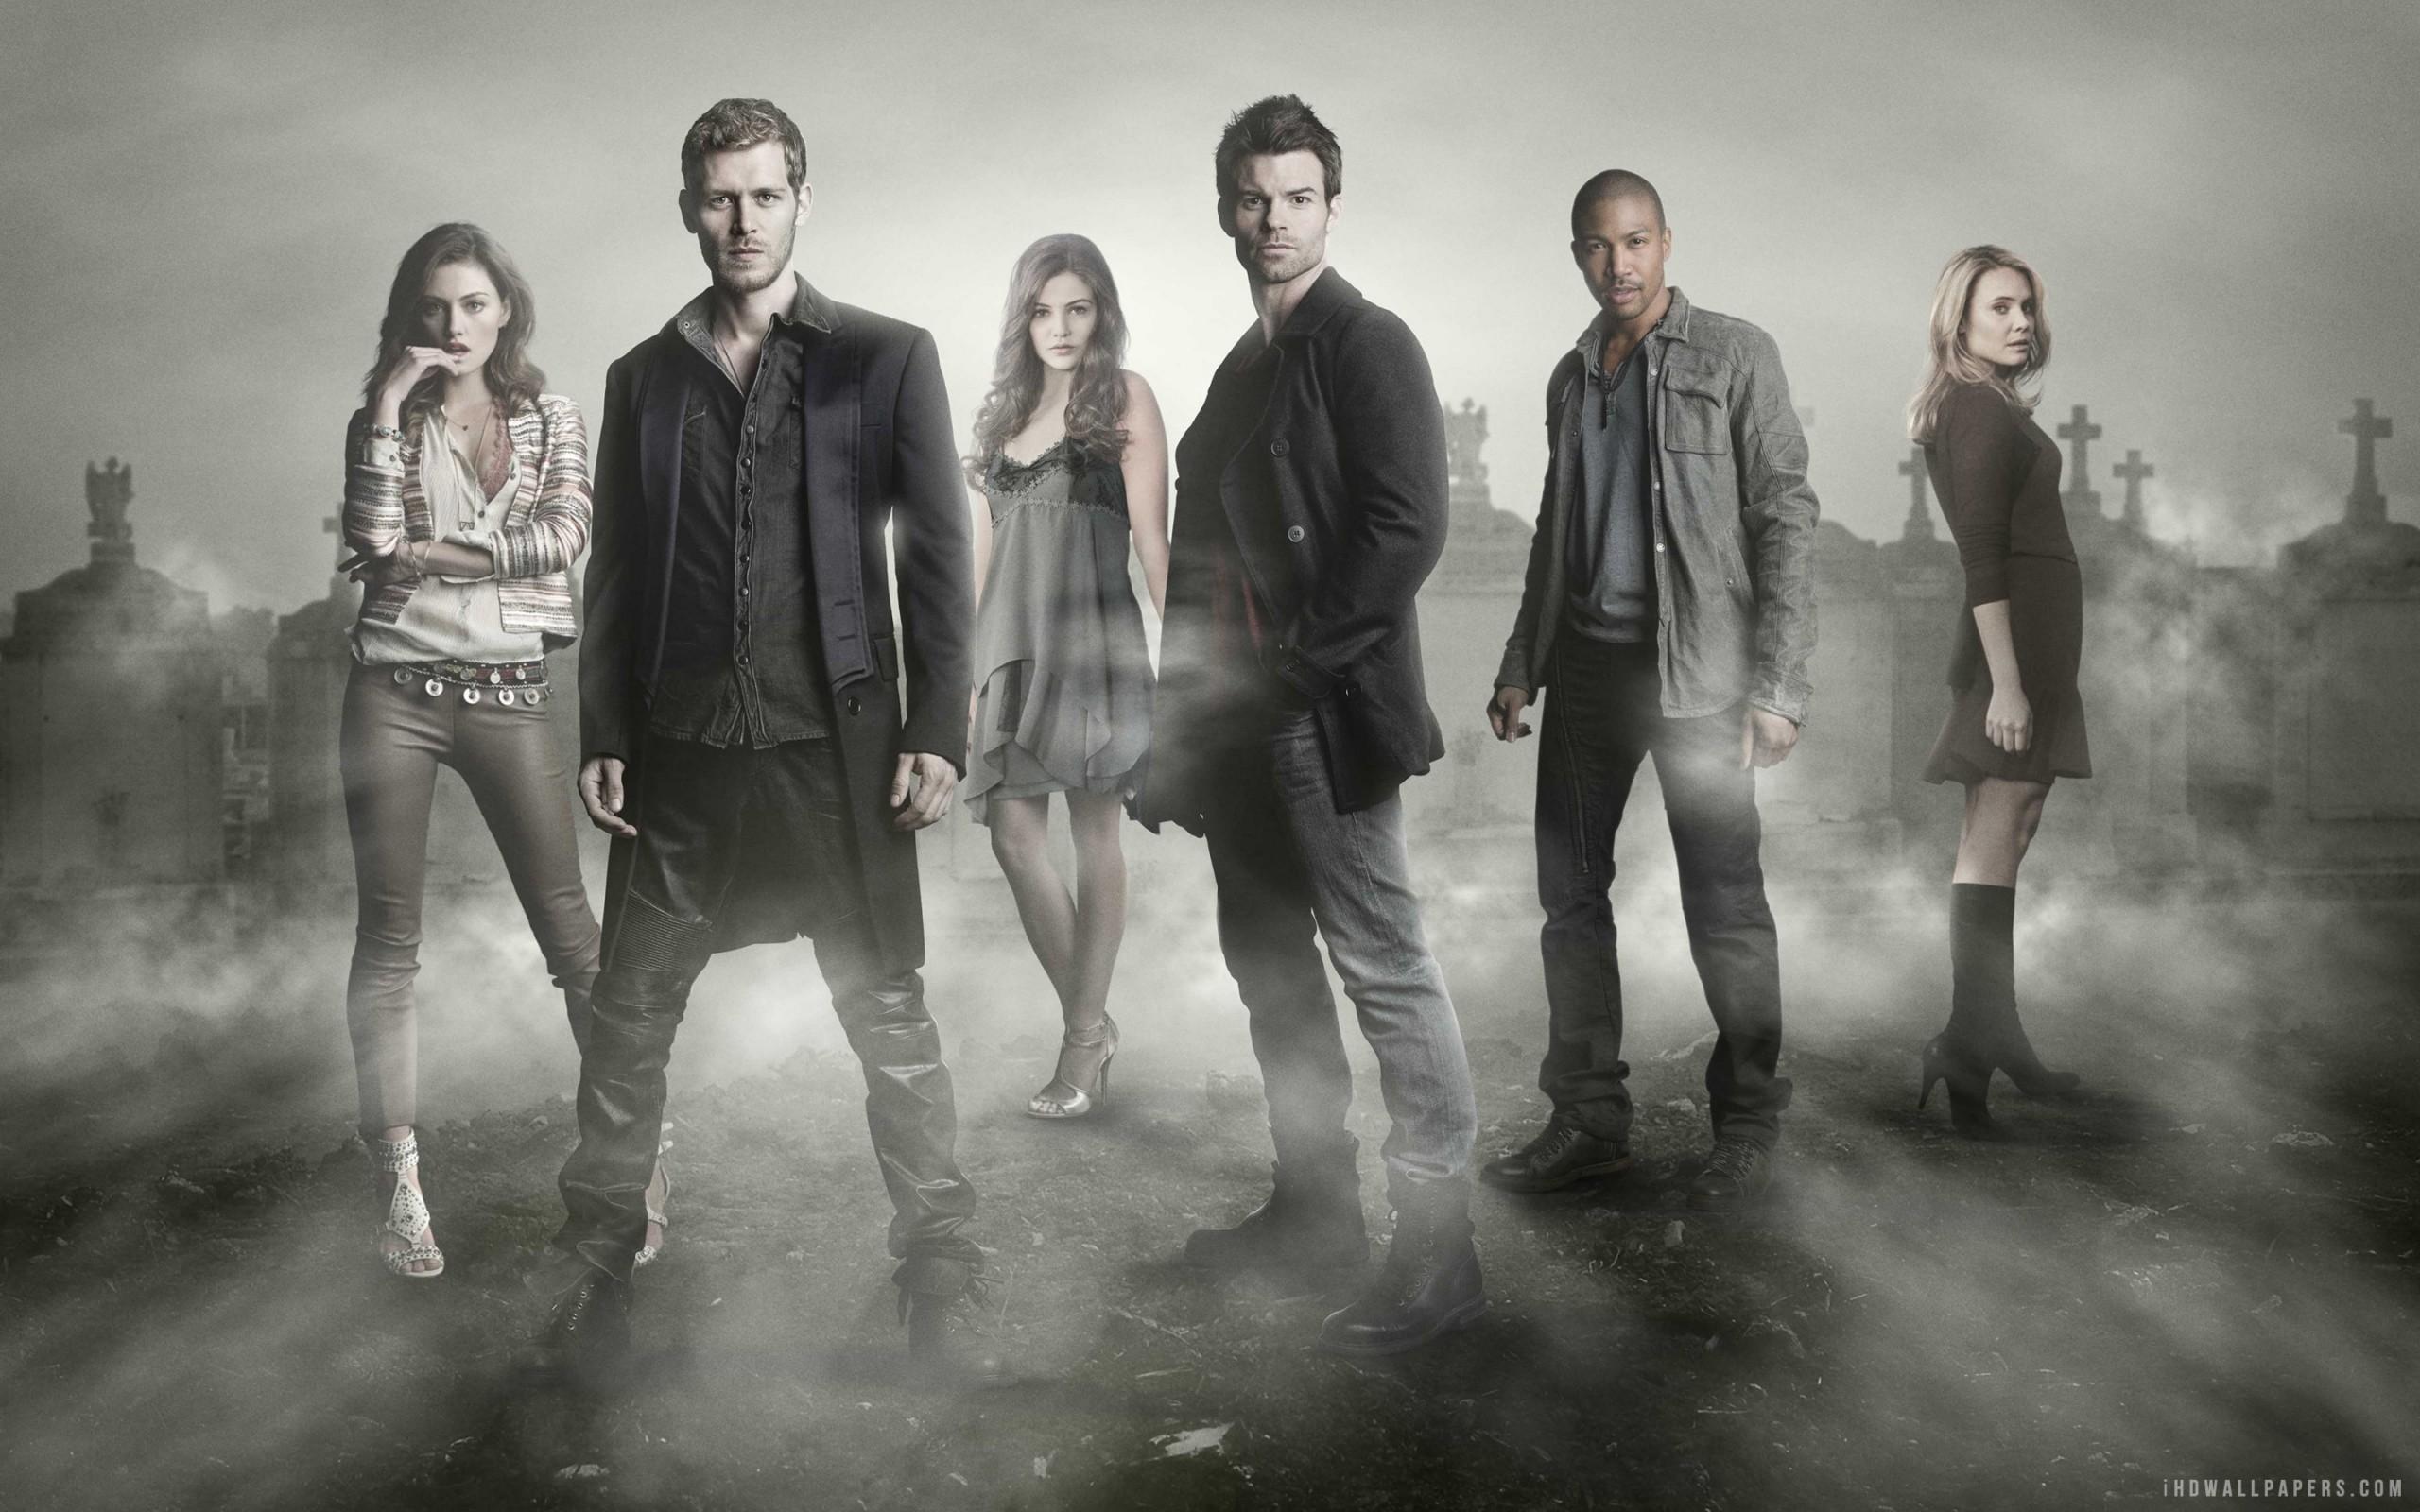 The Originals Season 3 wallpapers (56 Wallpapers)